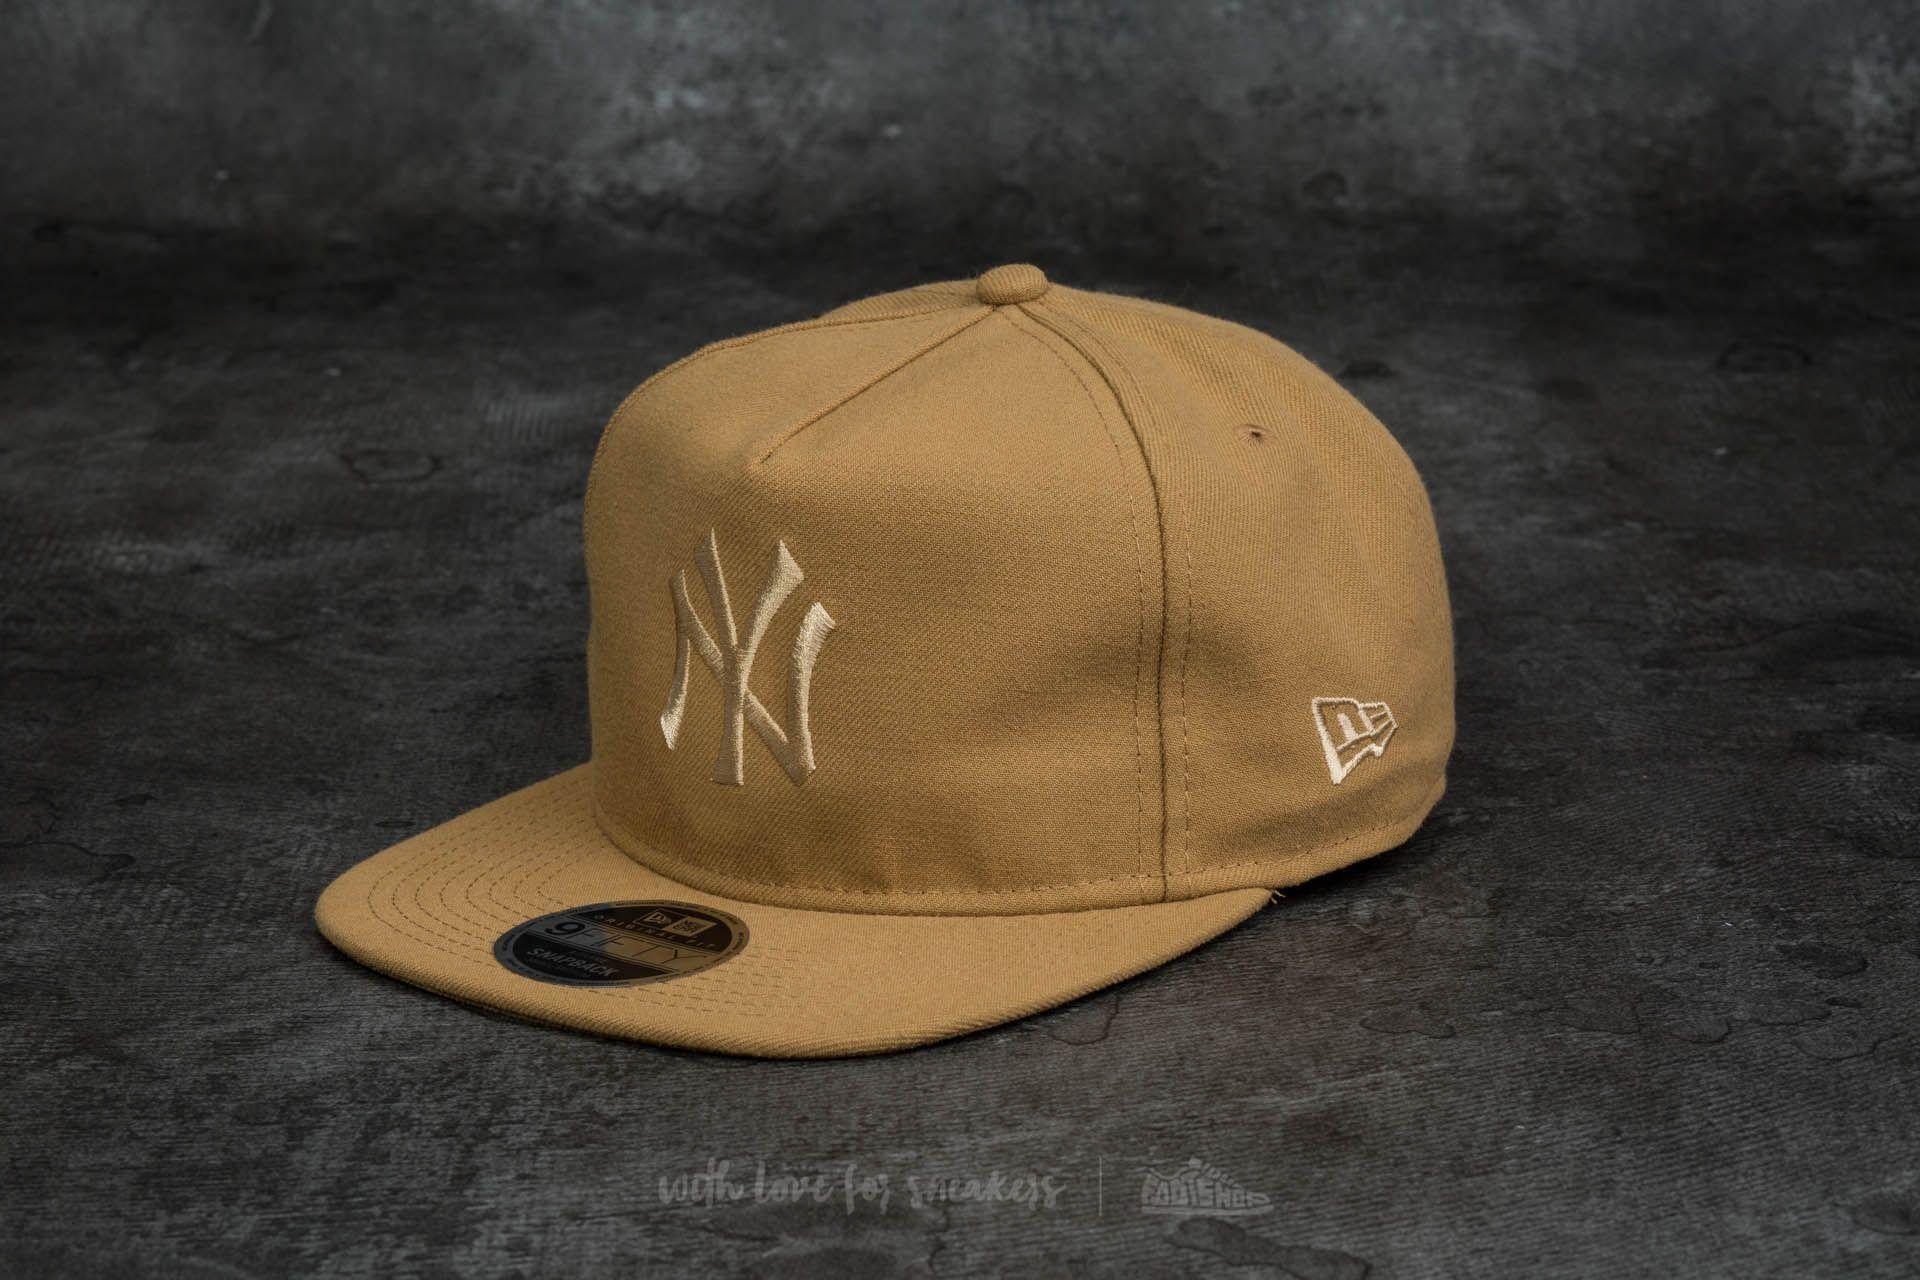 97324f60bb2 New Era 9Fifty Tonal Unstructured New York Yankees Cap Sand ...